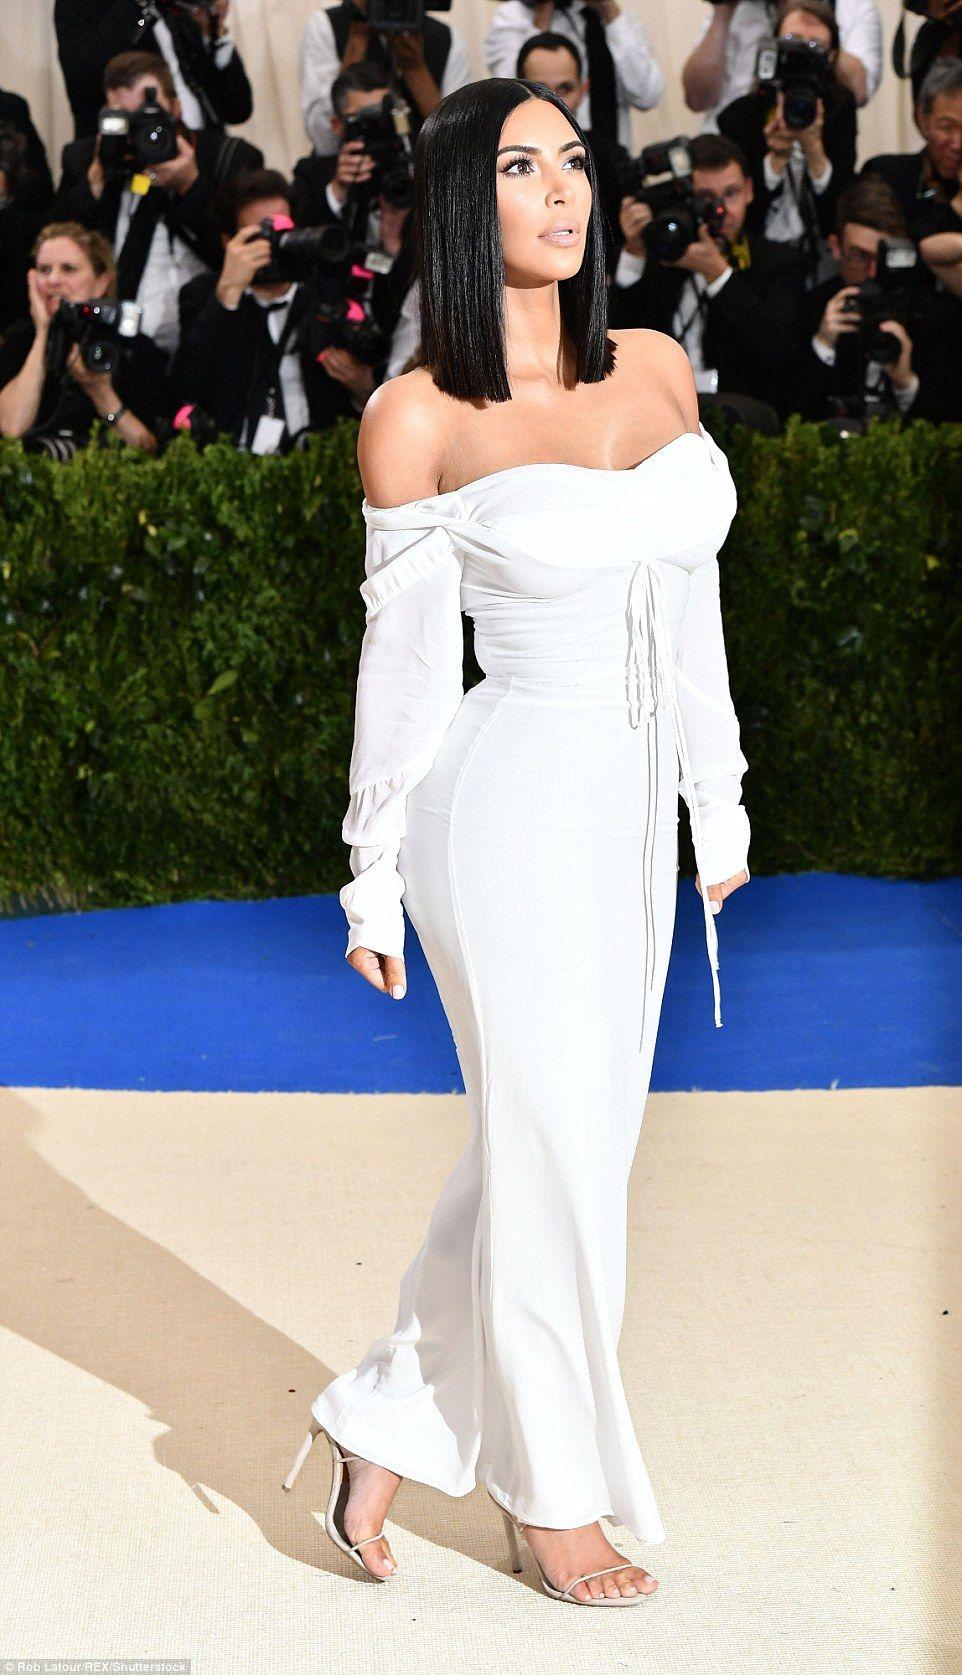 Kim kardashian shuns bling to play the peasant girl at met gala